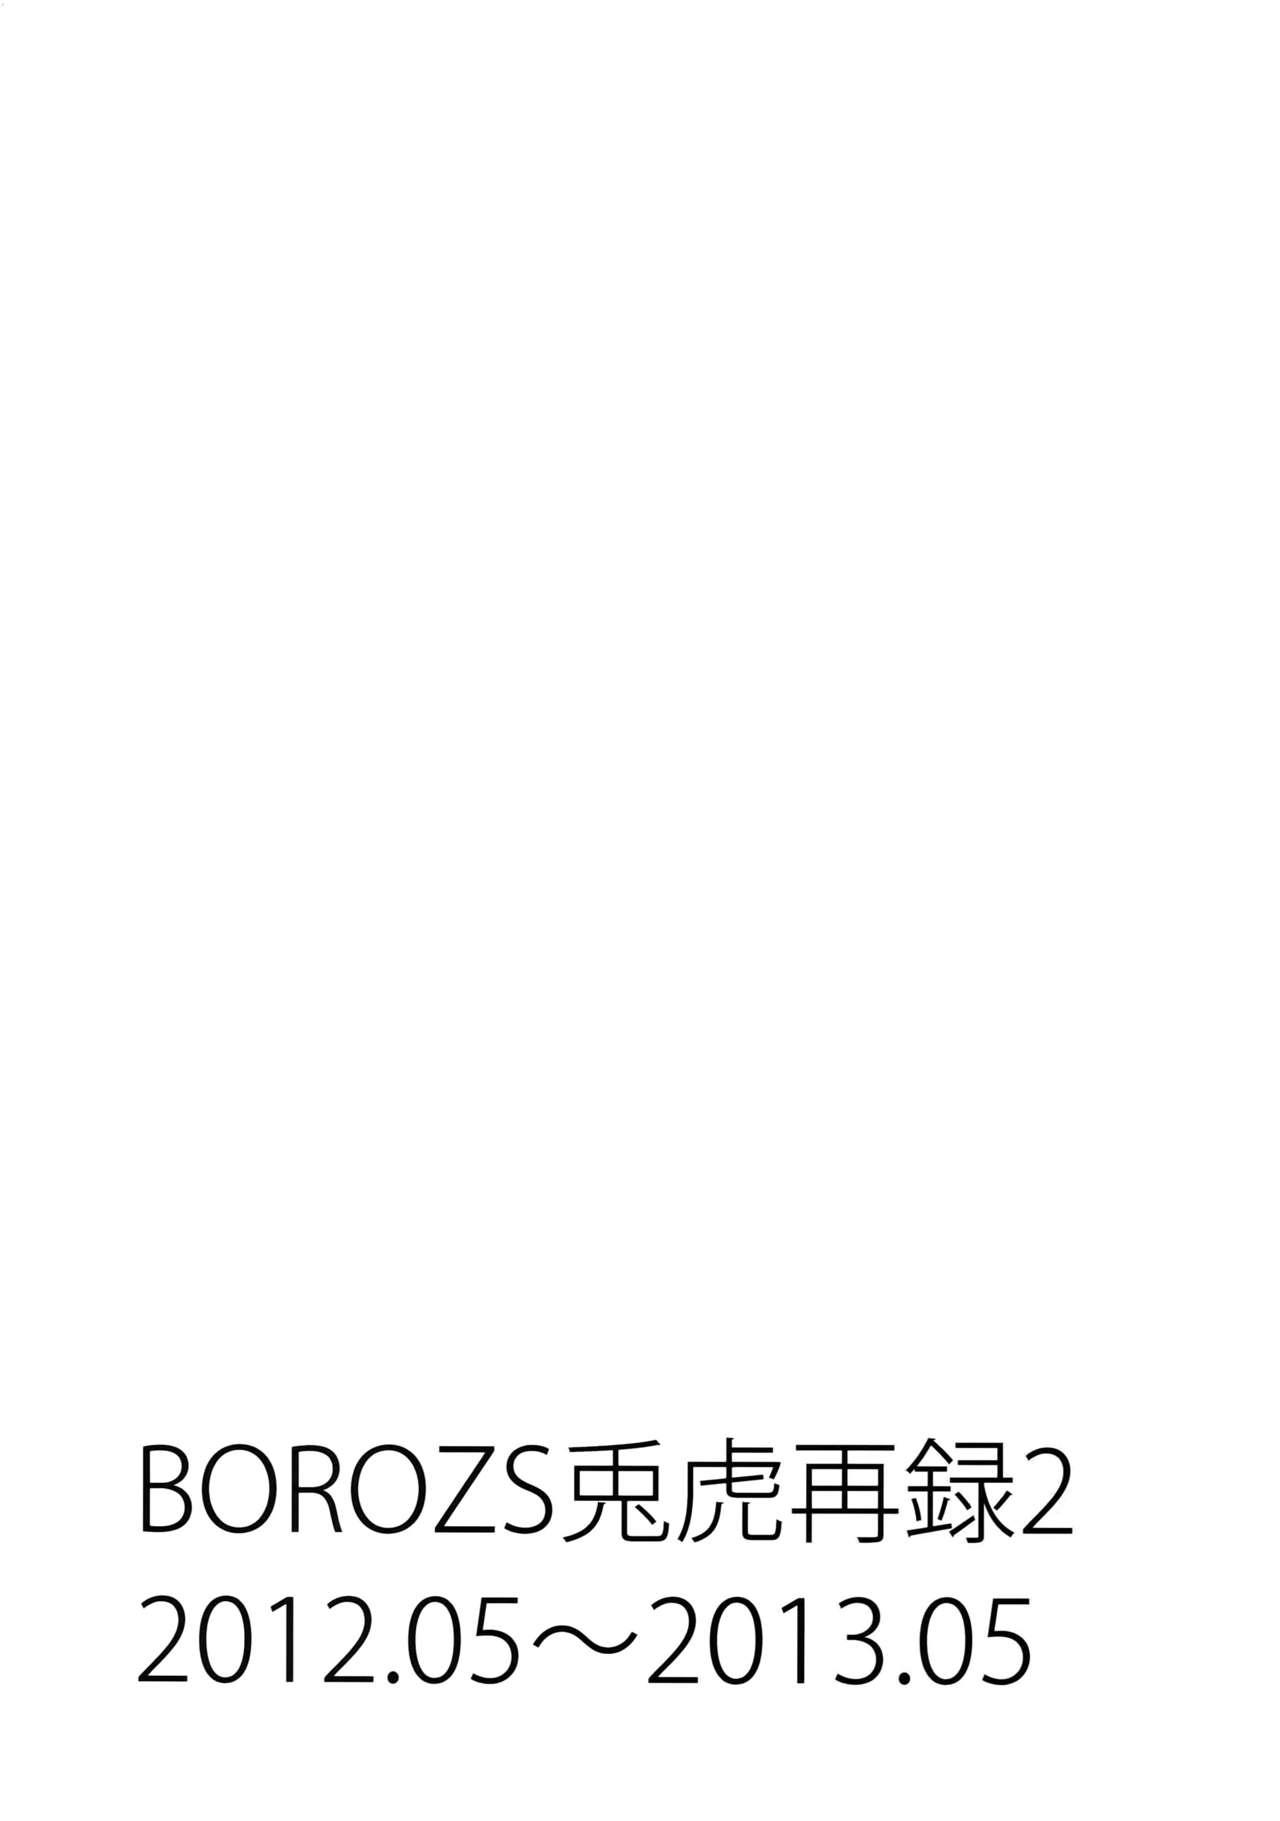 BOROZS Usagi Tora Sairoku 2 1